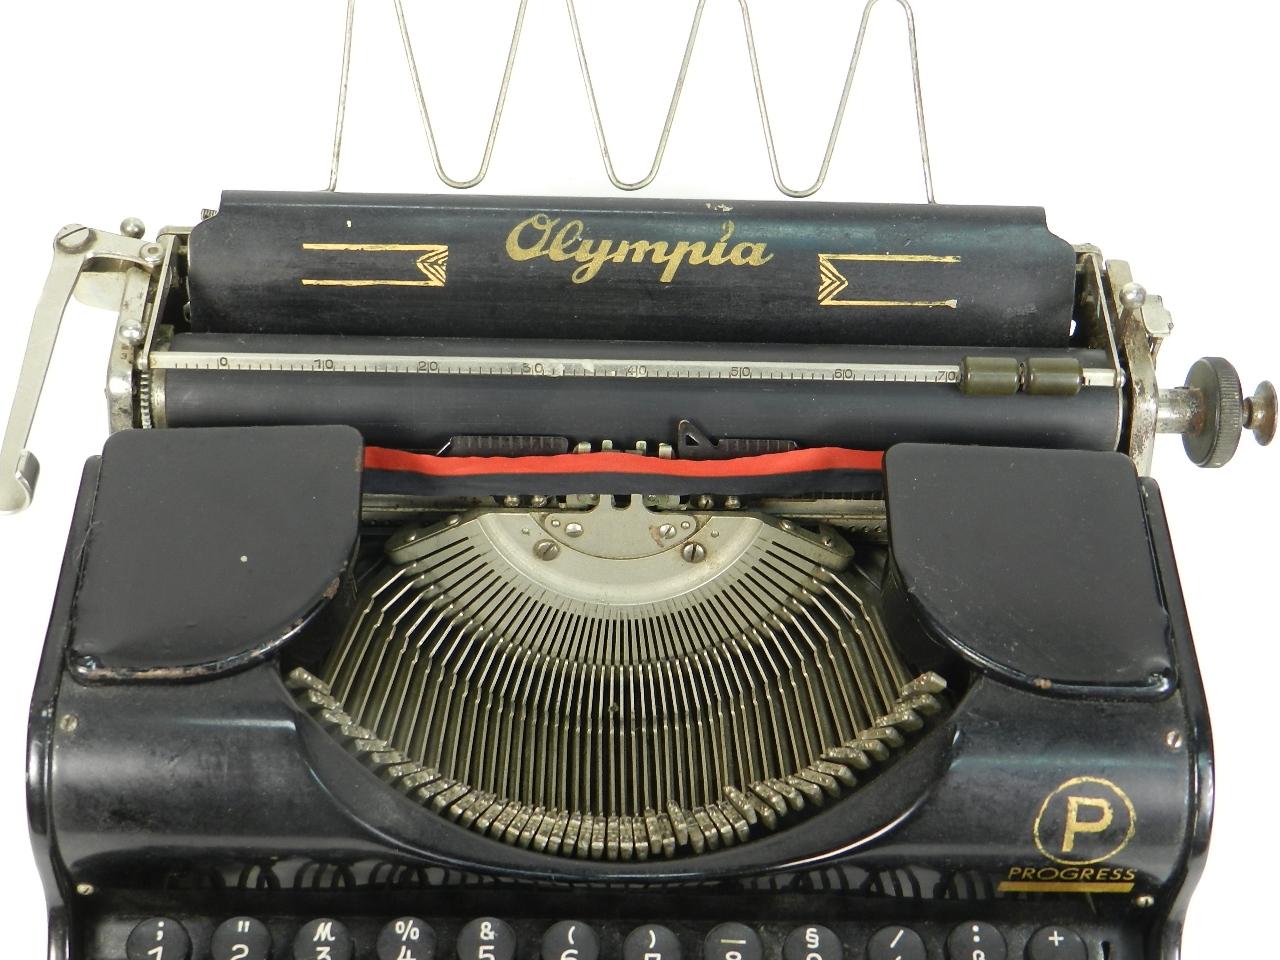 Imagen OLYMPIA PROGRESS  AÑO 1935 29846